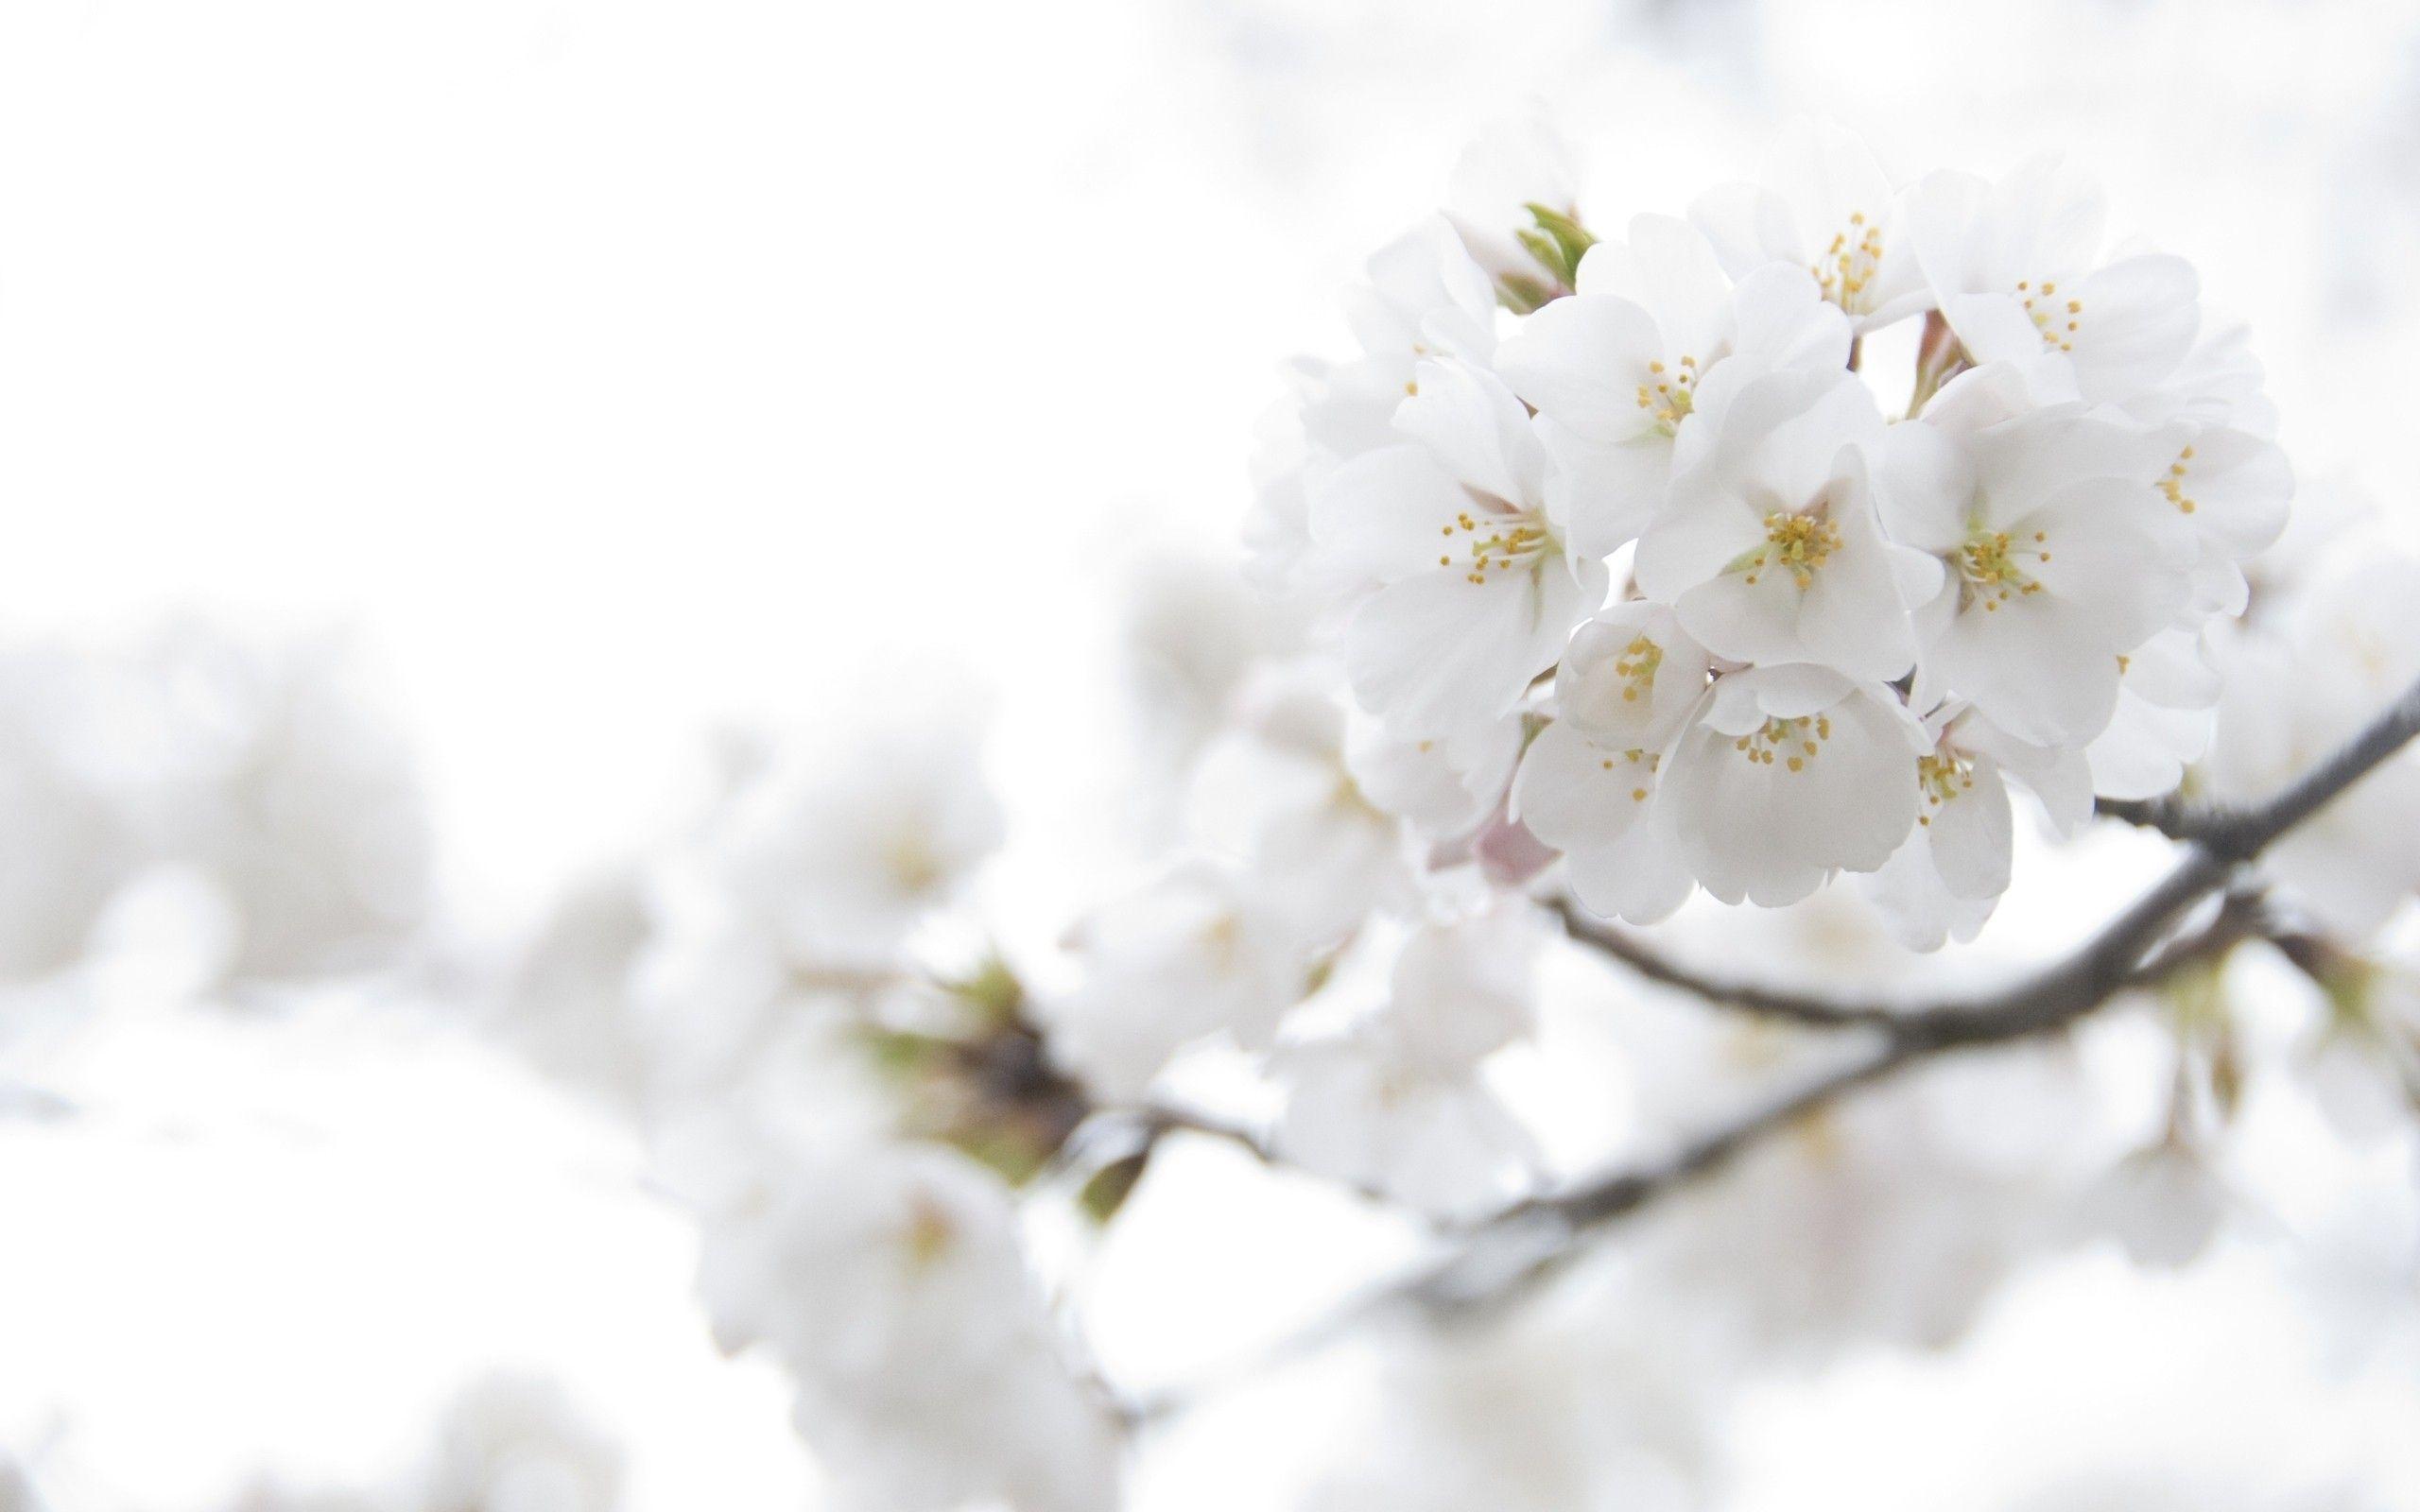 Beautiful white flowers wallpaper free linked in pinterest beautiful white flowers wallpaper free mightylinksfo Images